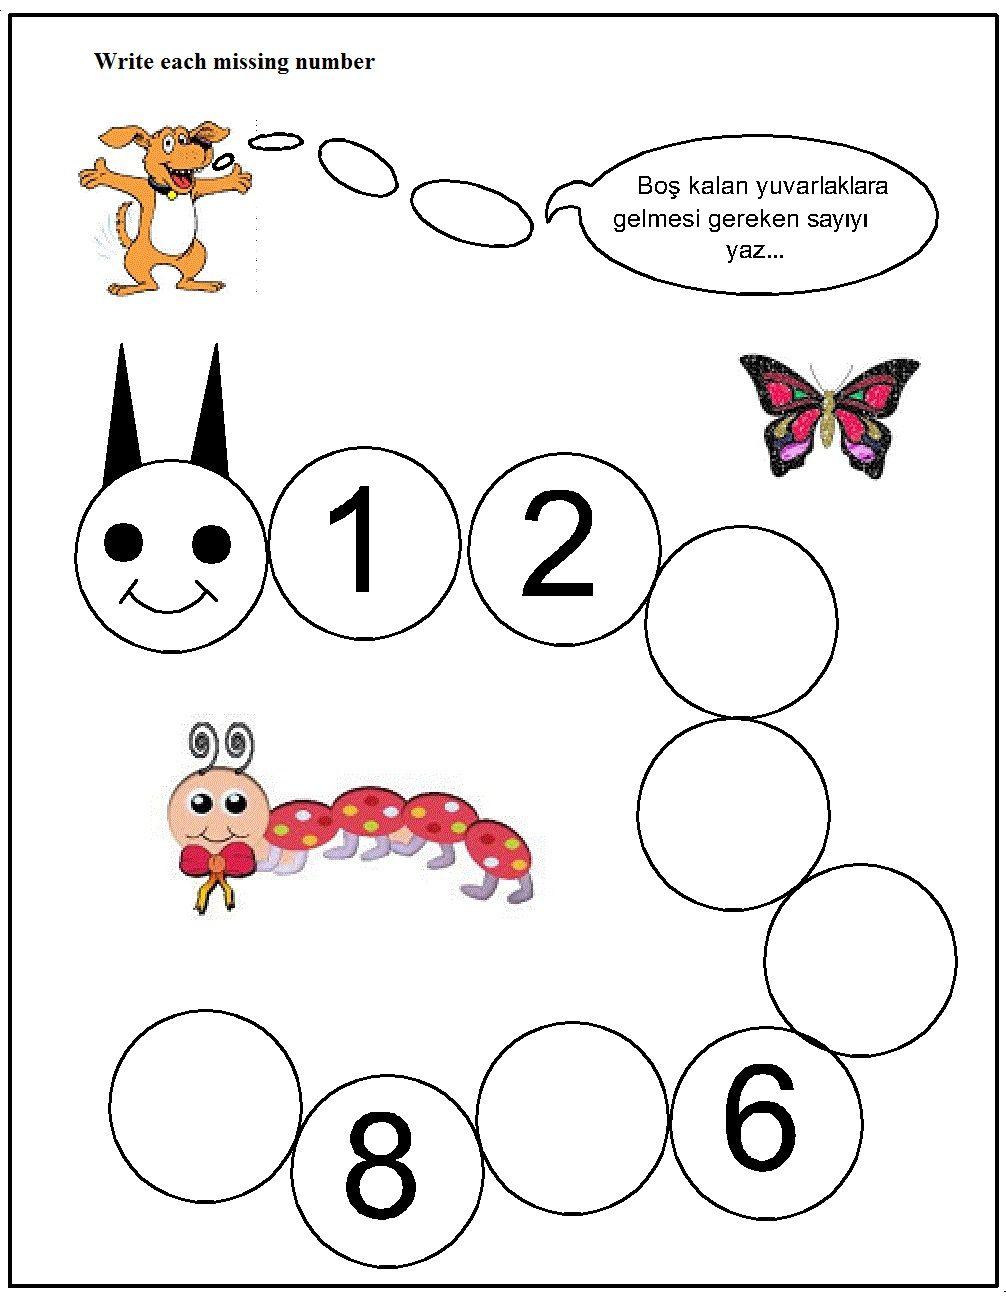 missing number worksheet for kids (6) | karty pracy | Pinterest ...